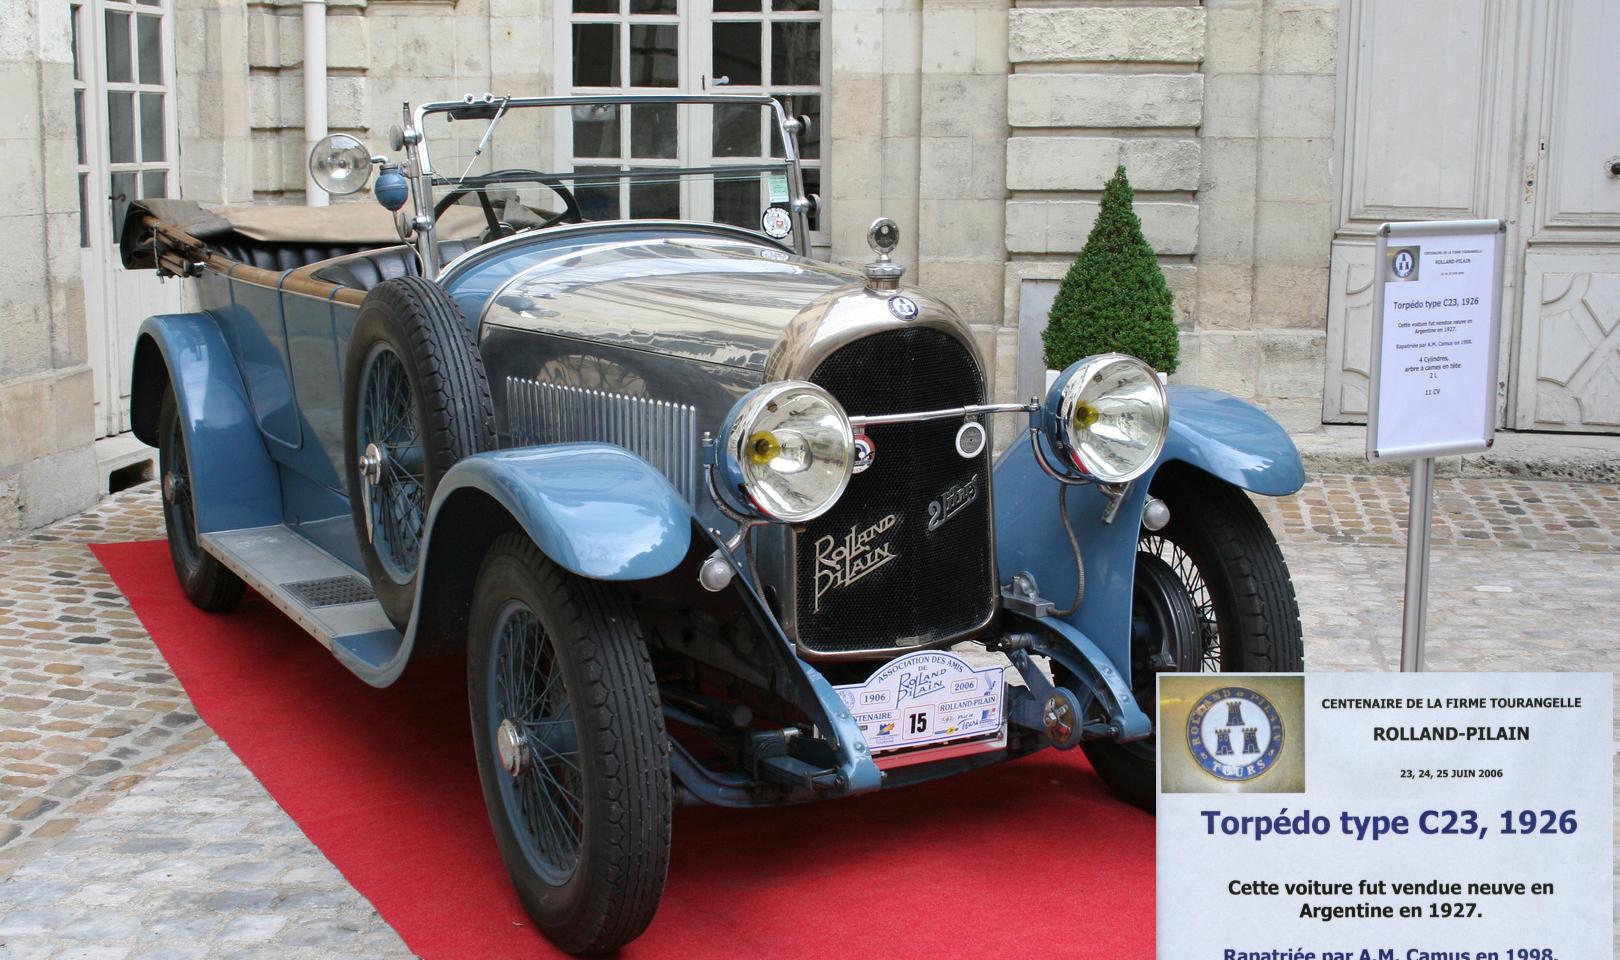 Torpédo C3 1926 Rolland Pilain